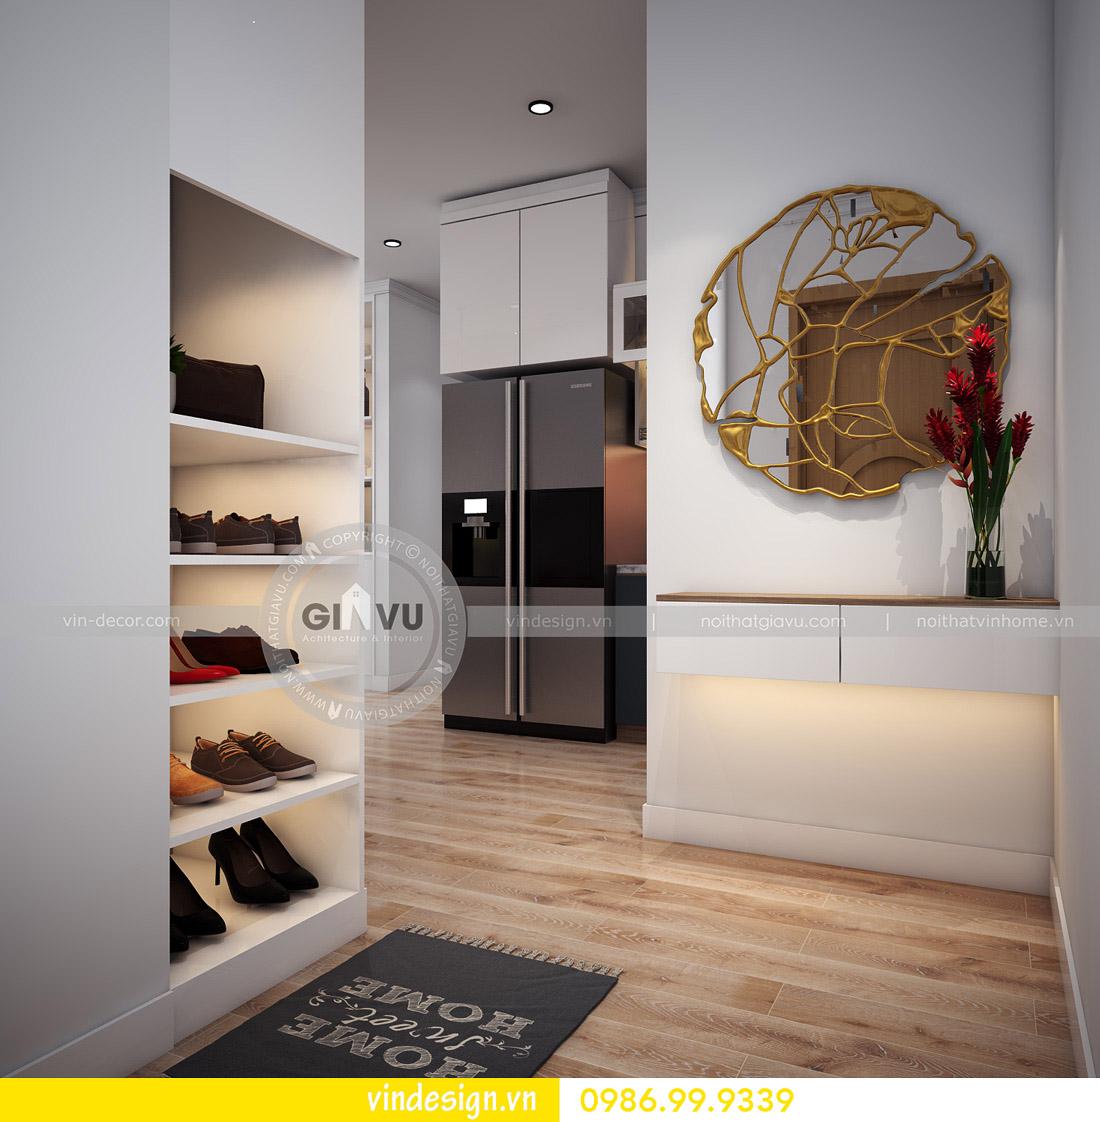 thiết kế nội thất căn hộ park hill hotline 0986999339 09